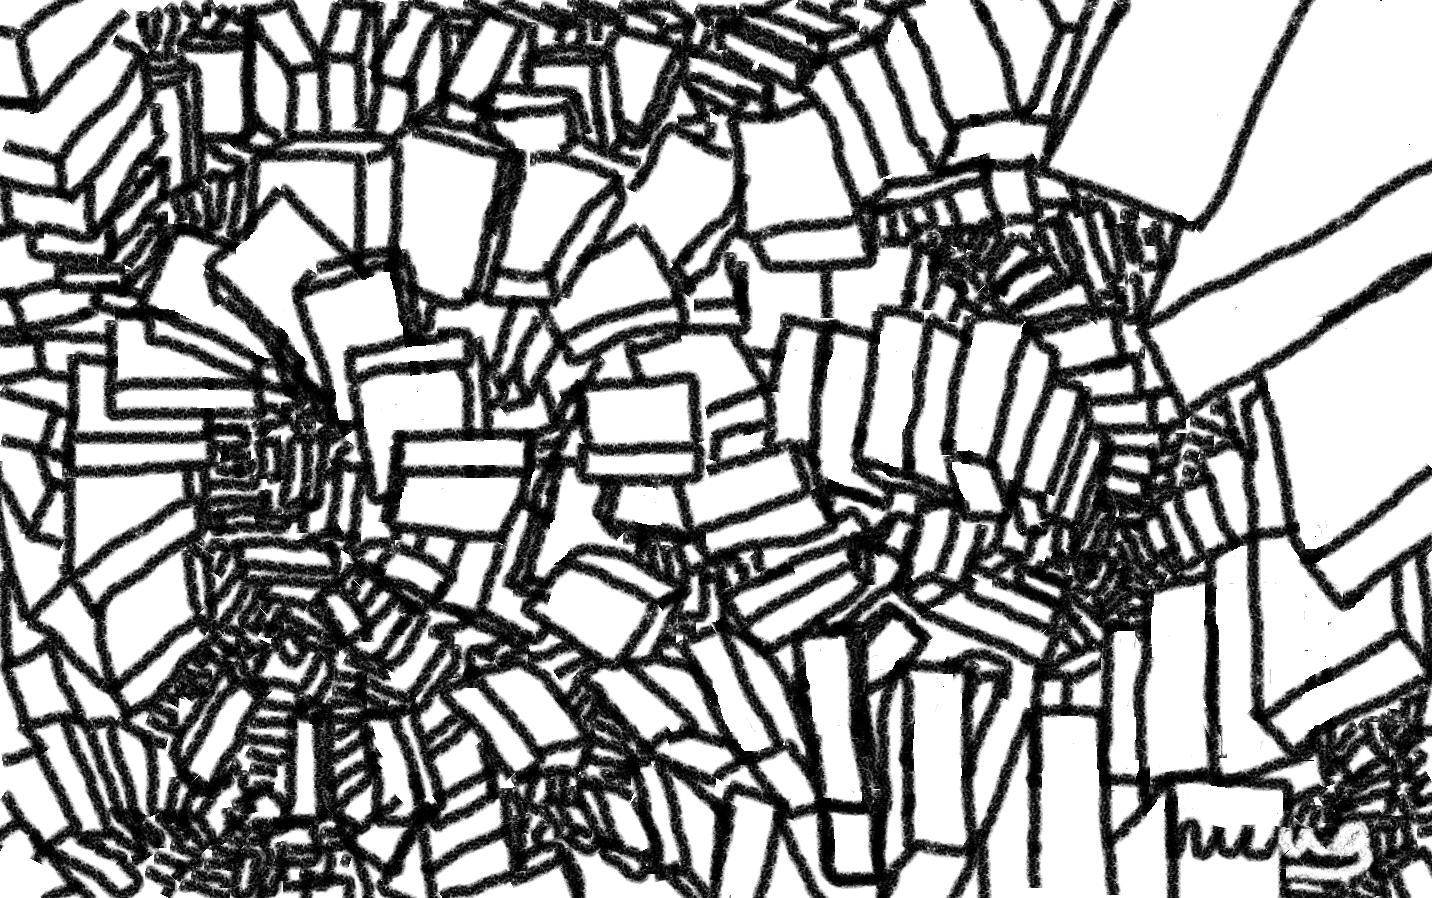 De profundis - domino stijl